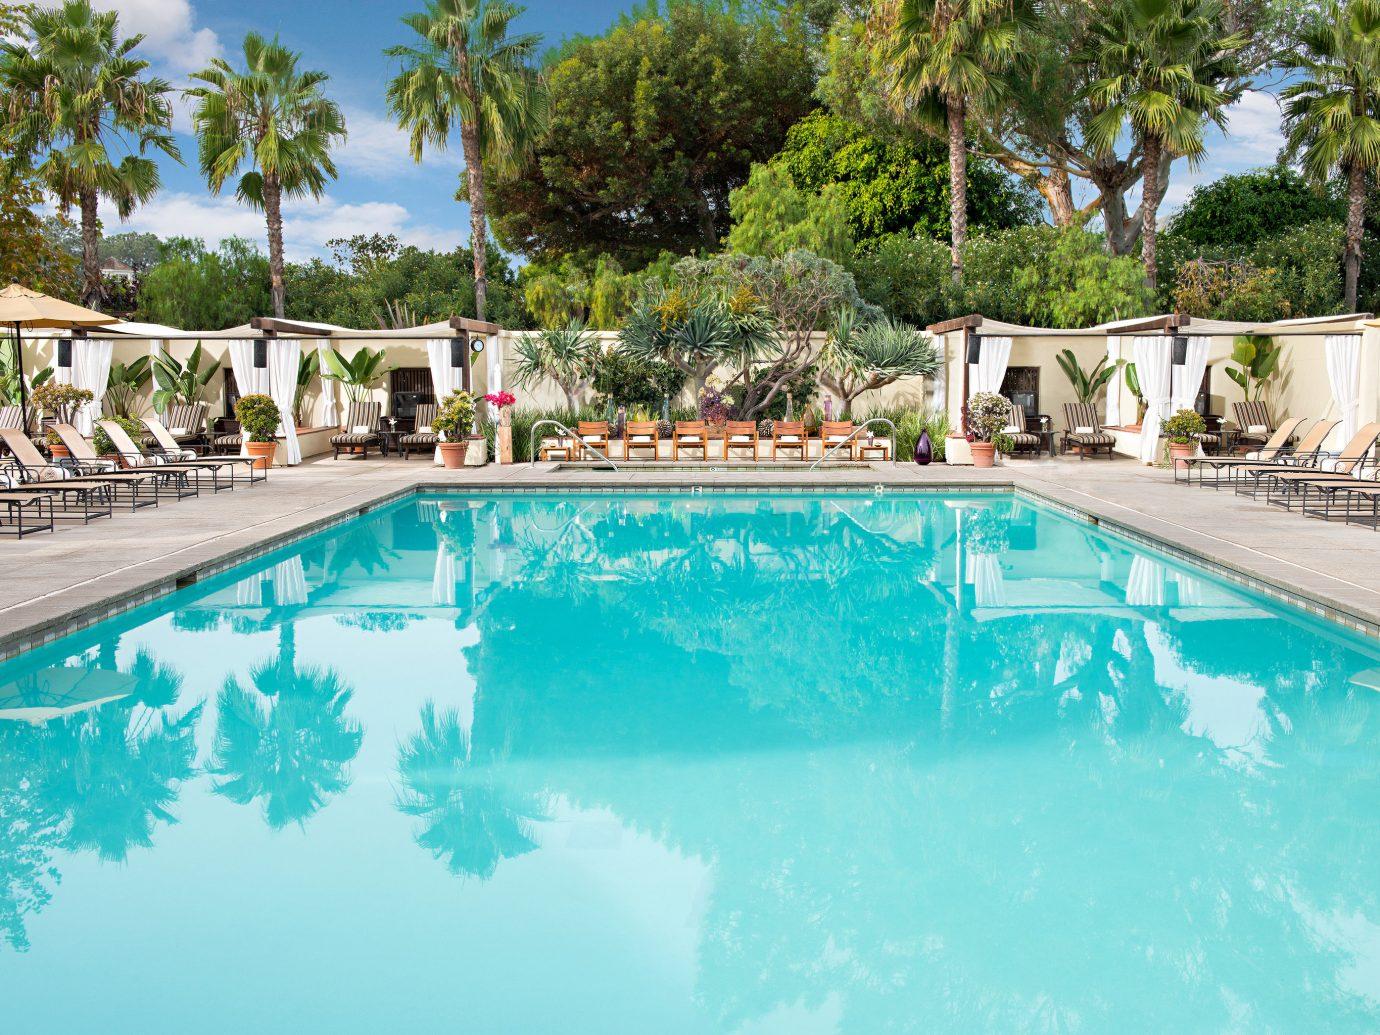 Outdoor Pool At Estancia Hotel And Spa In La Jolla, San Diego